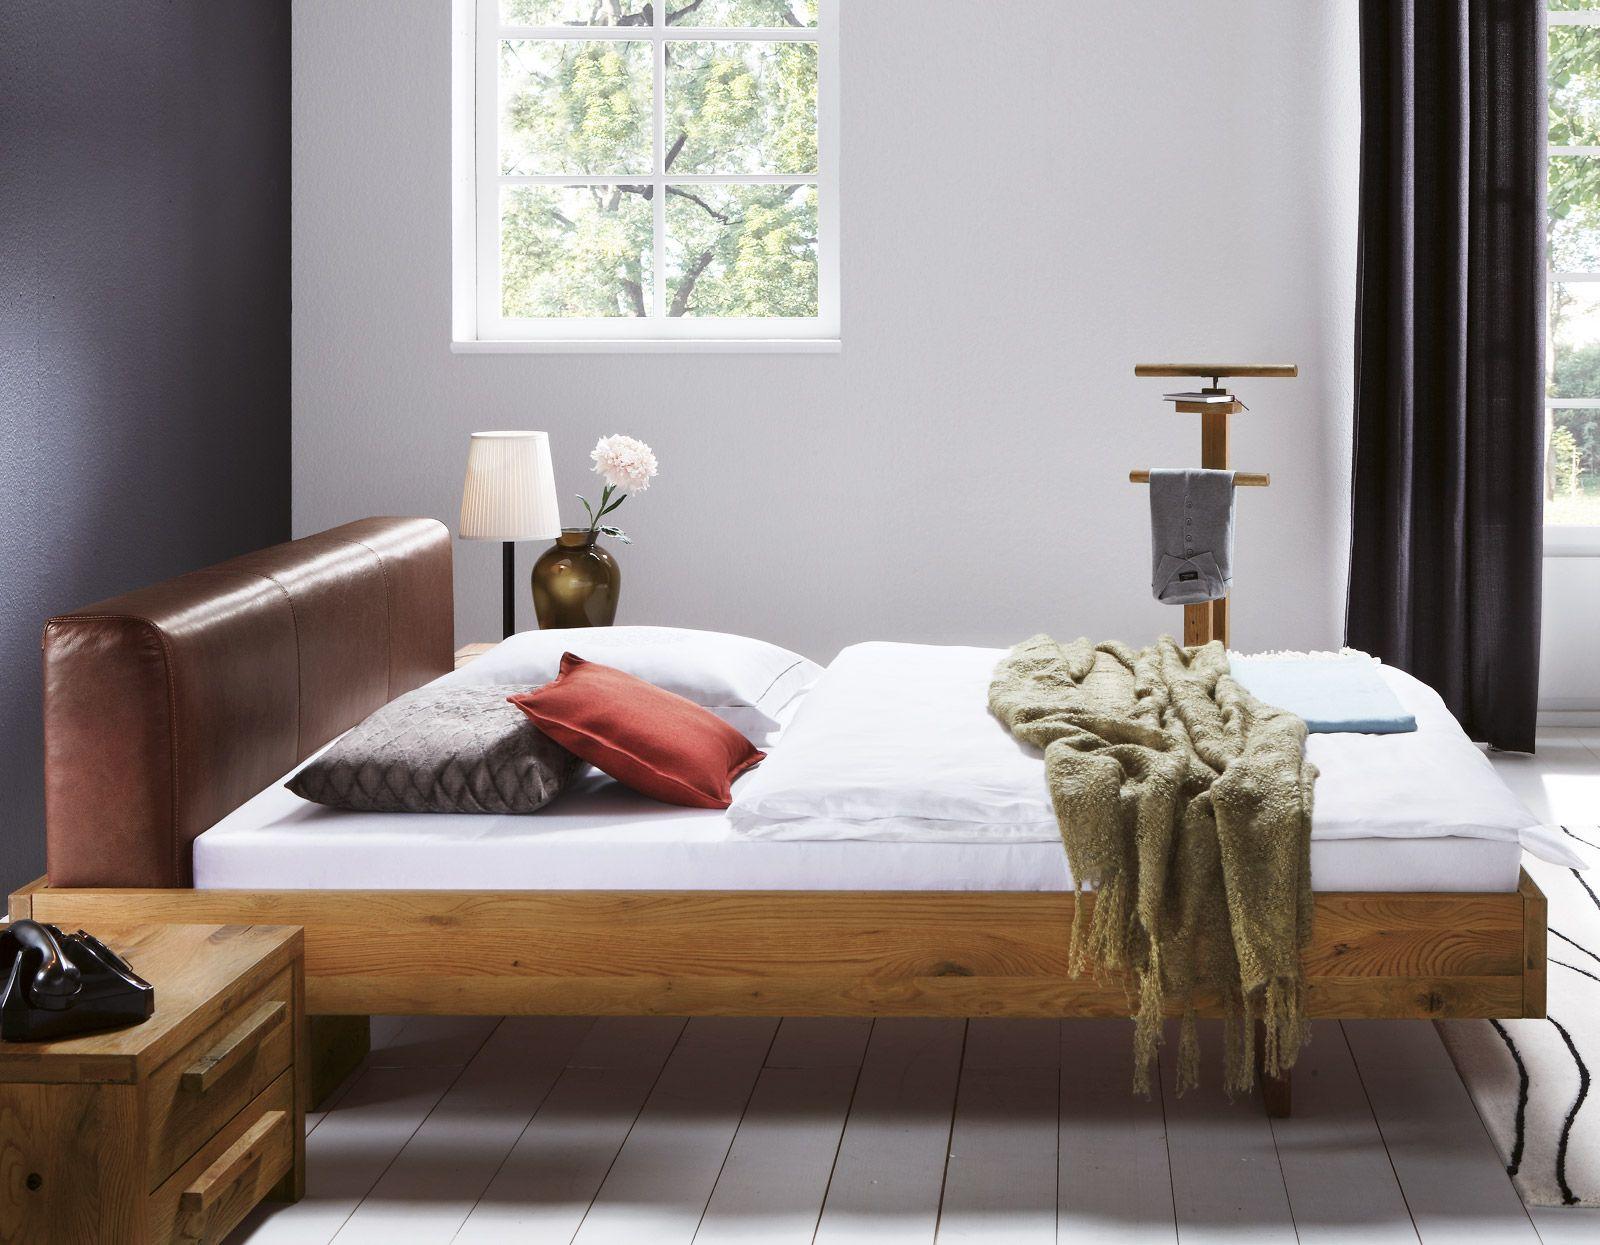 Holzbett rustikal hoch  Bett aus Wildeiche mit rustikalem Leder-Kopfteil | Betten ...